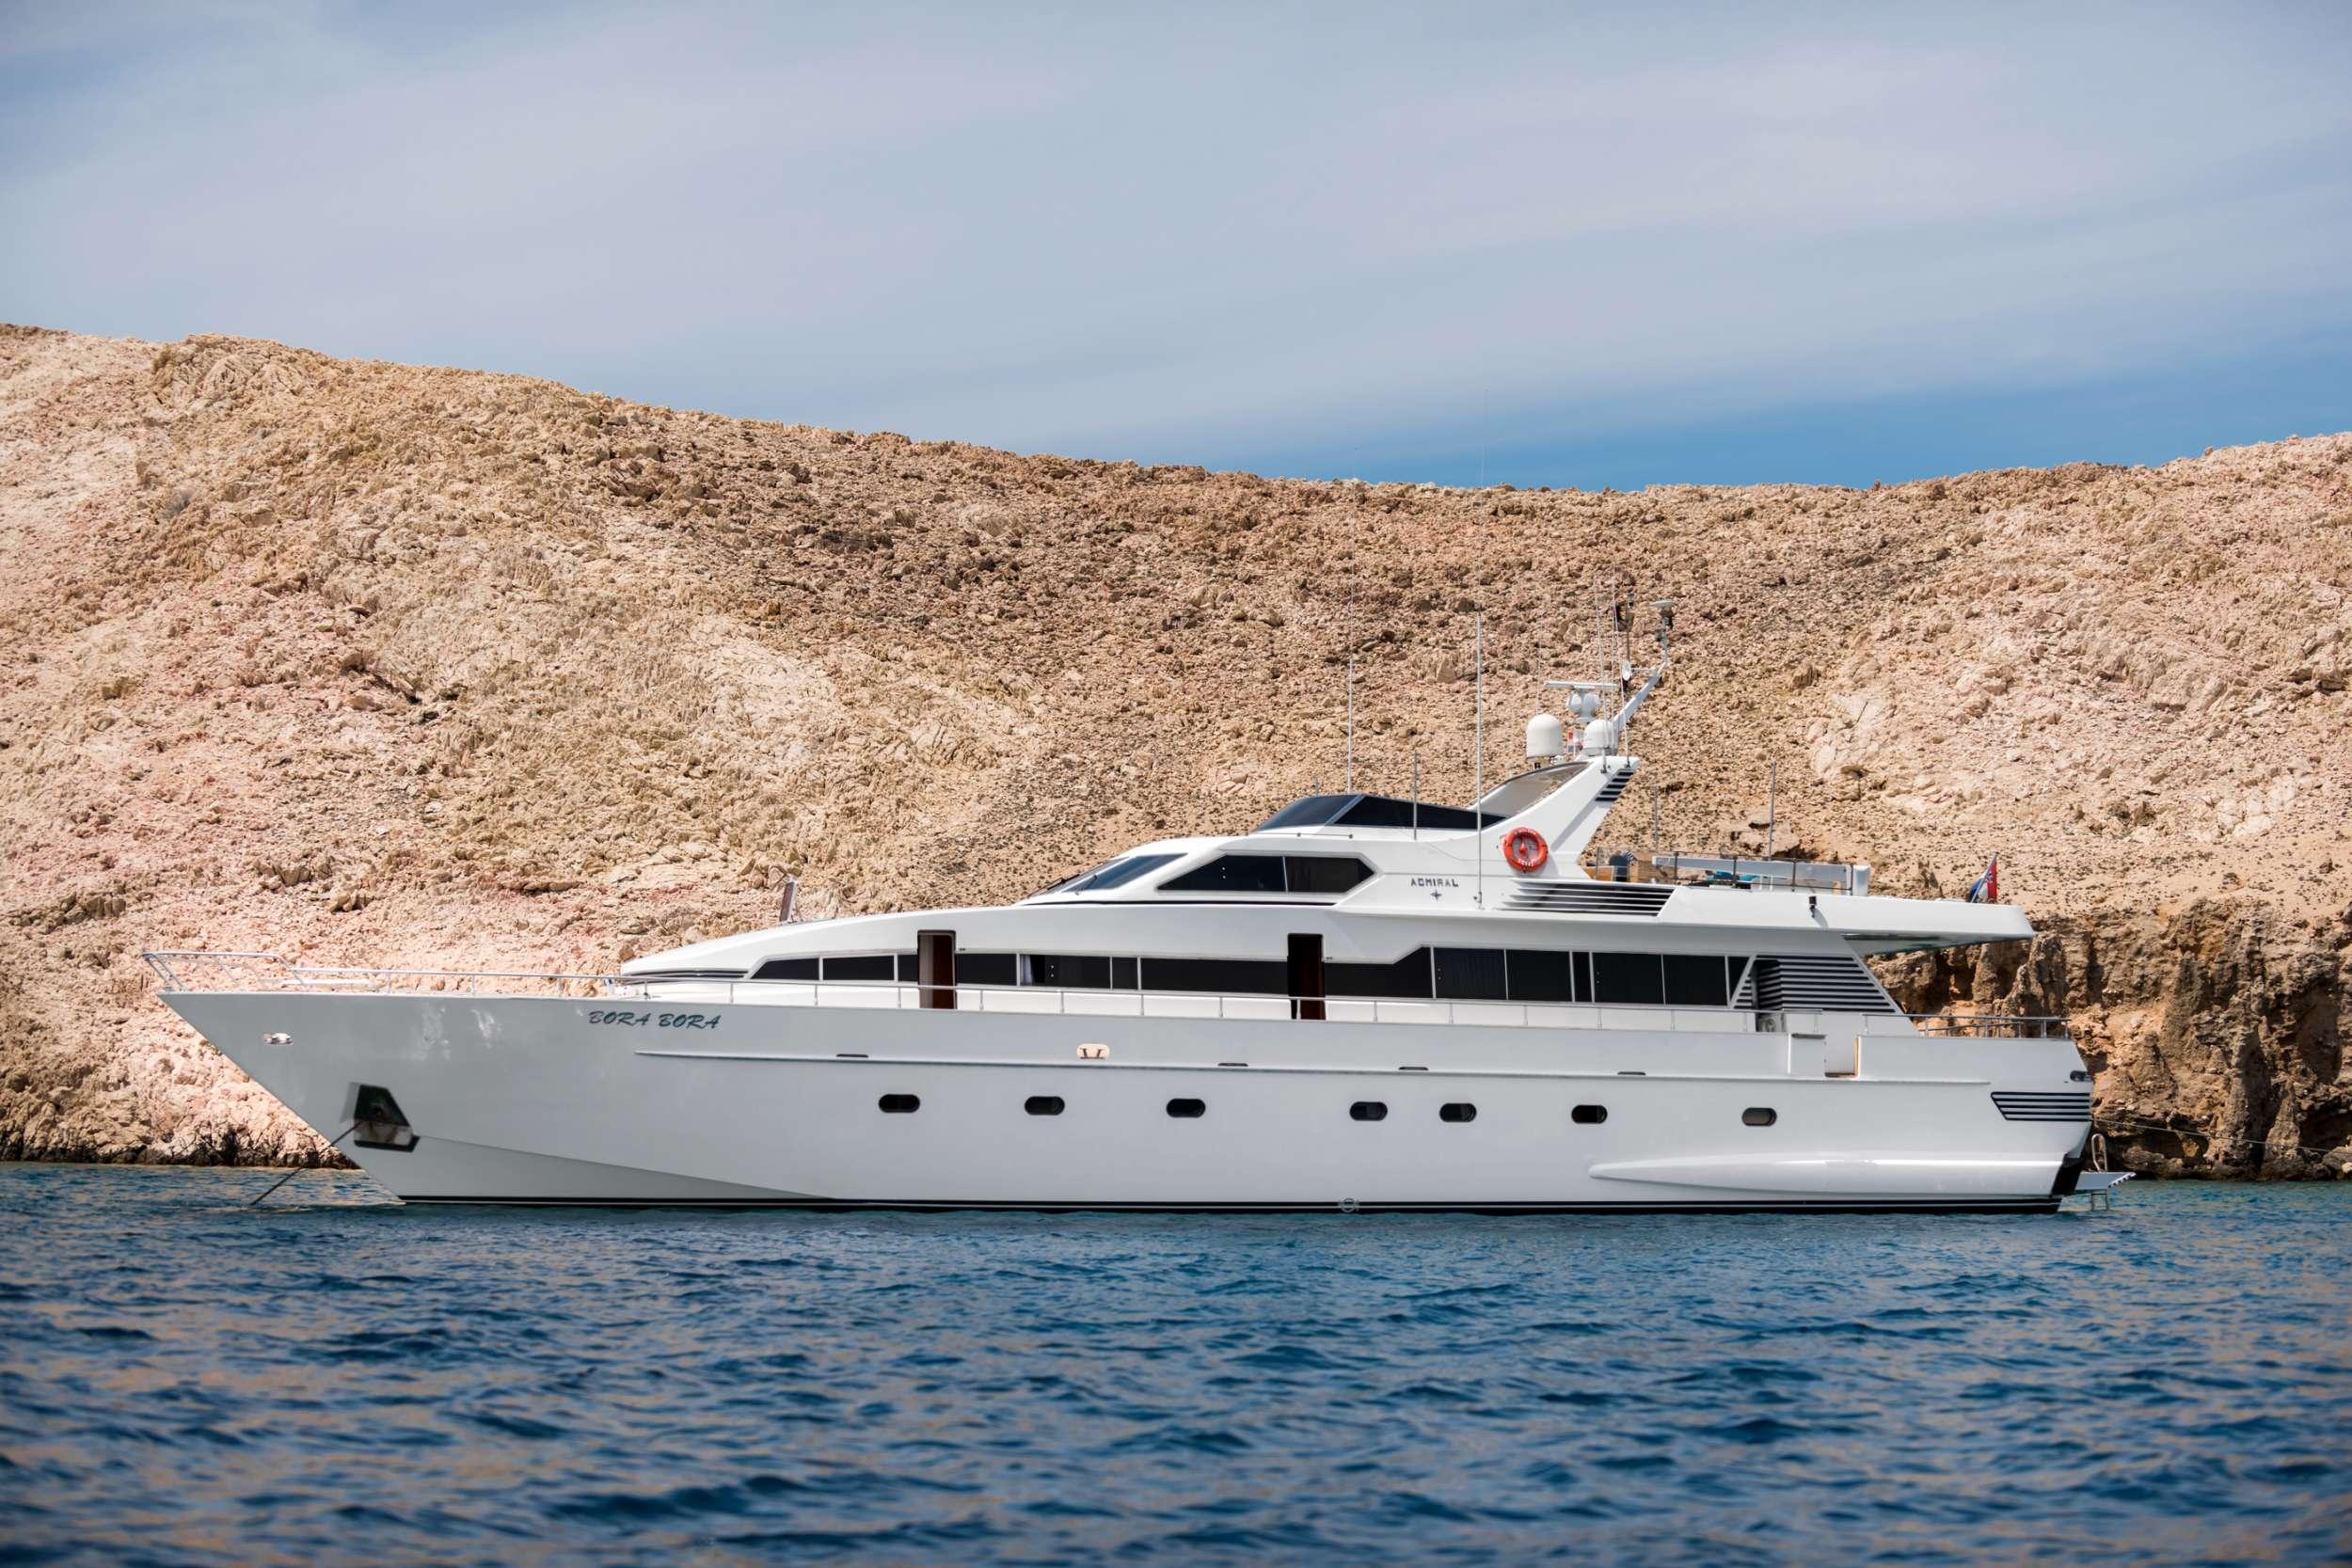 Main image of Bora Bora yacht